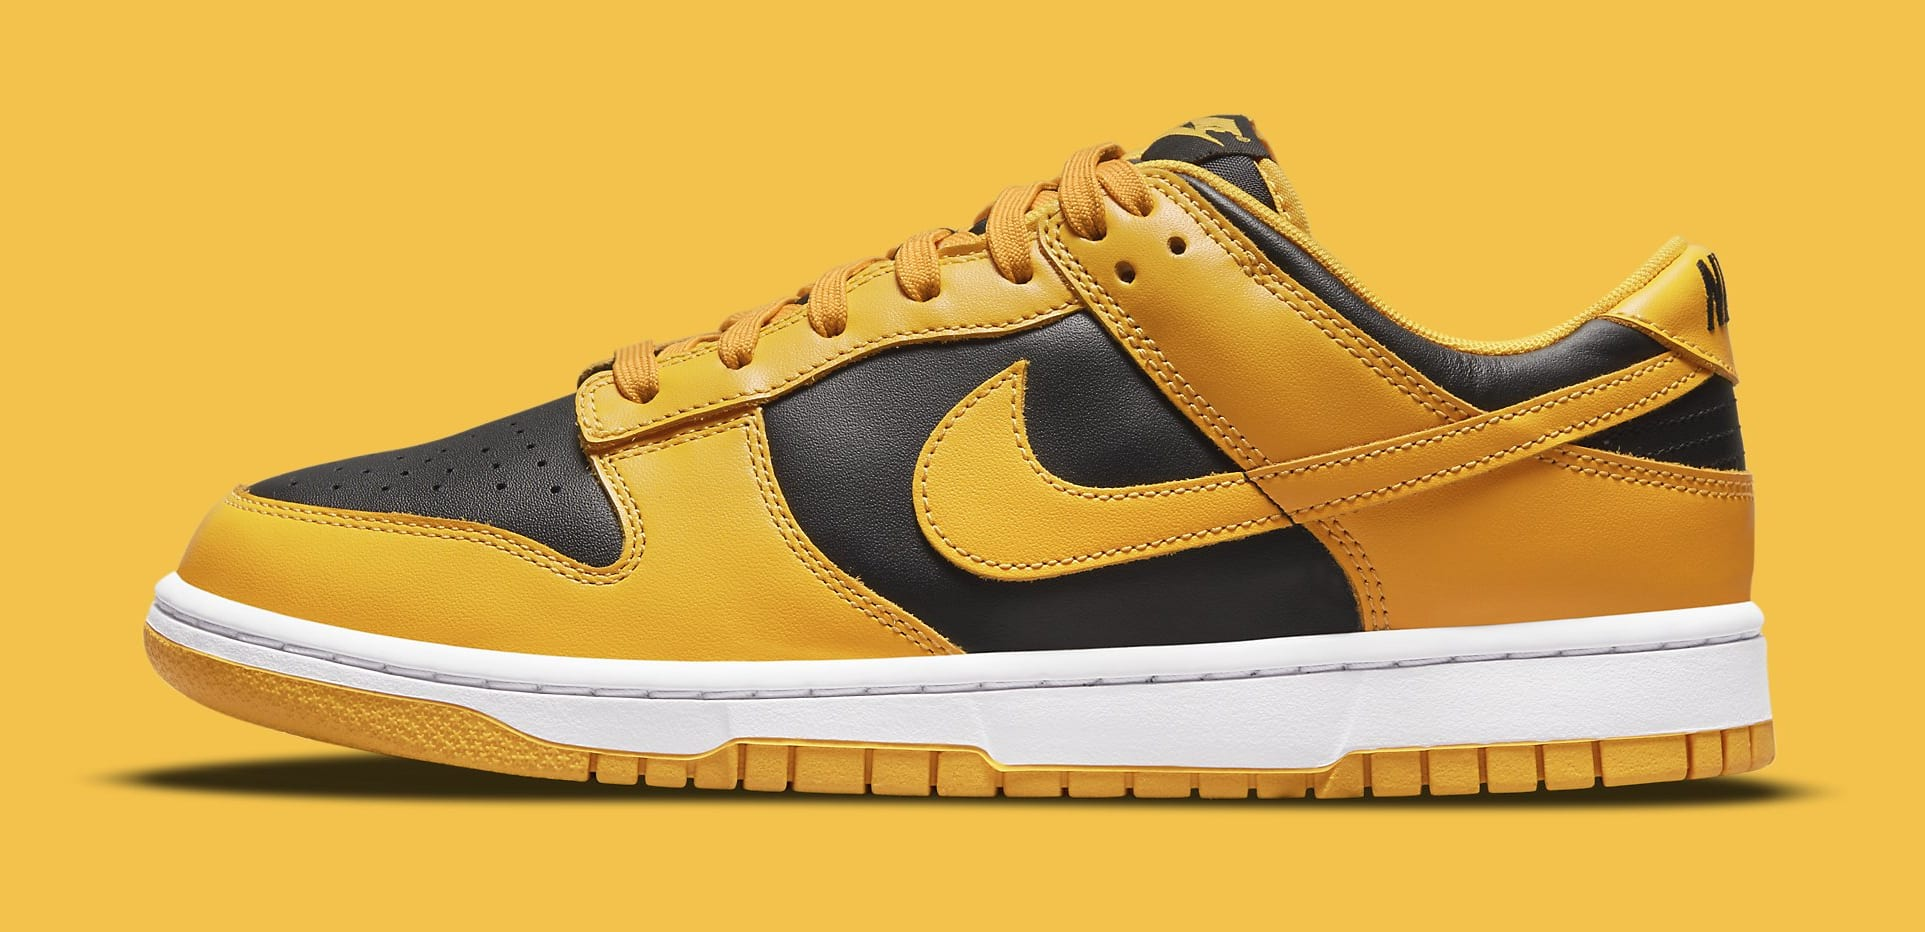 Nike Dunk Low 'Iowa' DD1391-004 (Lateral)